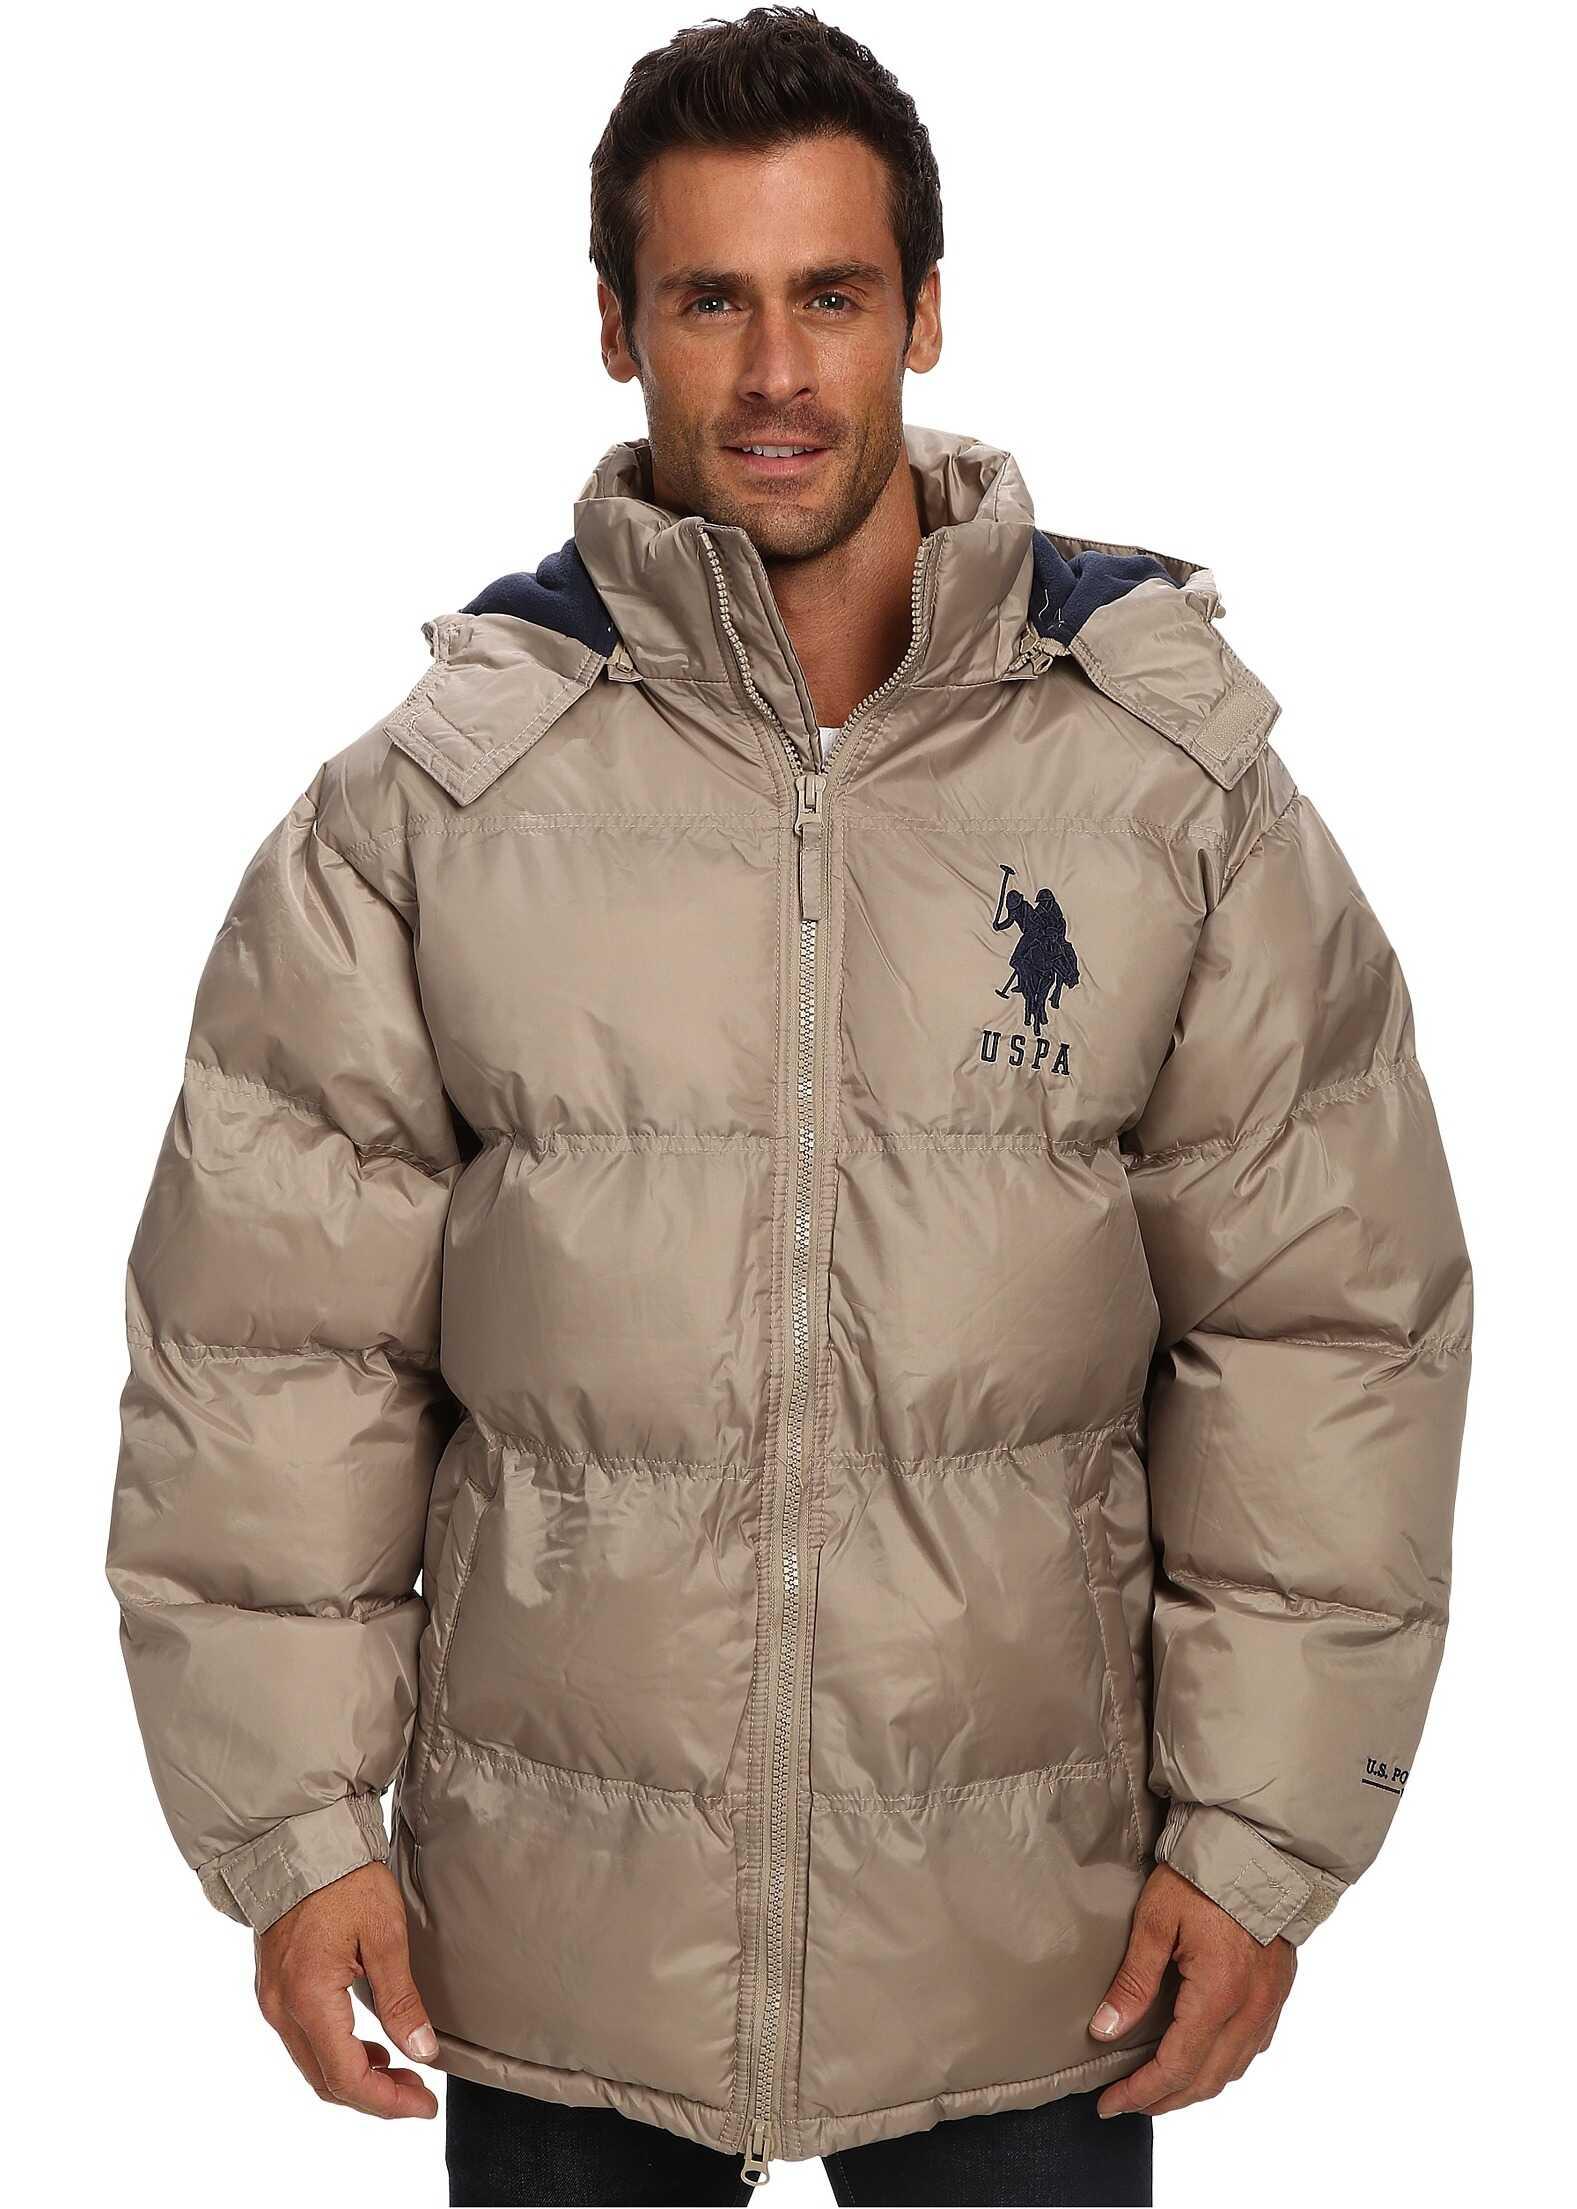 U.S. POLO ASSN. Signature Long Bubble Coat w/ Large Pony & Polar Fleece Lining Thomston Khaki